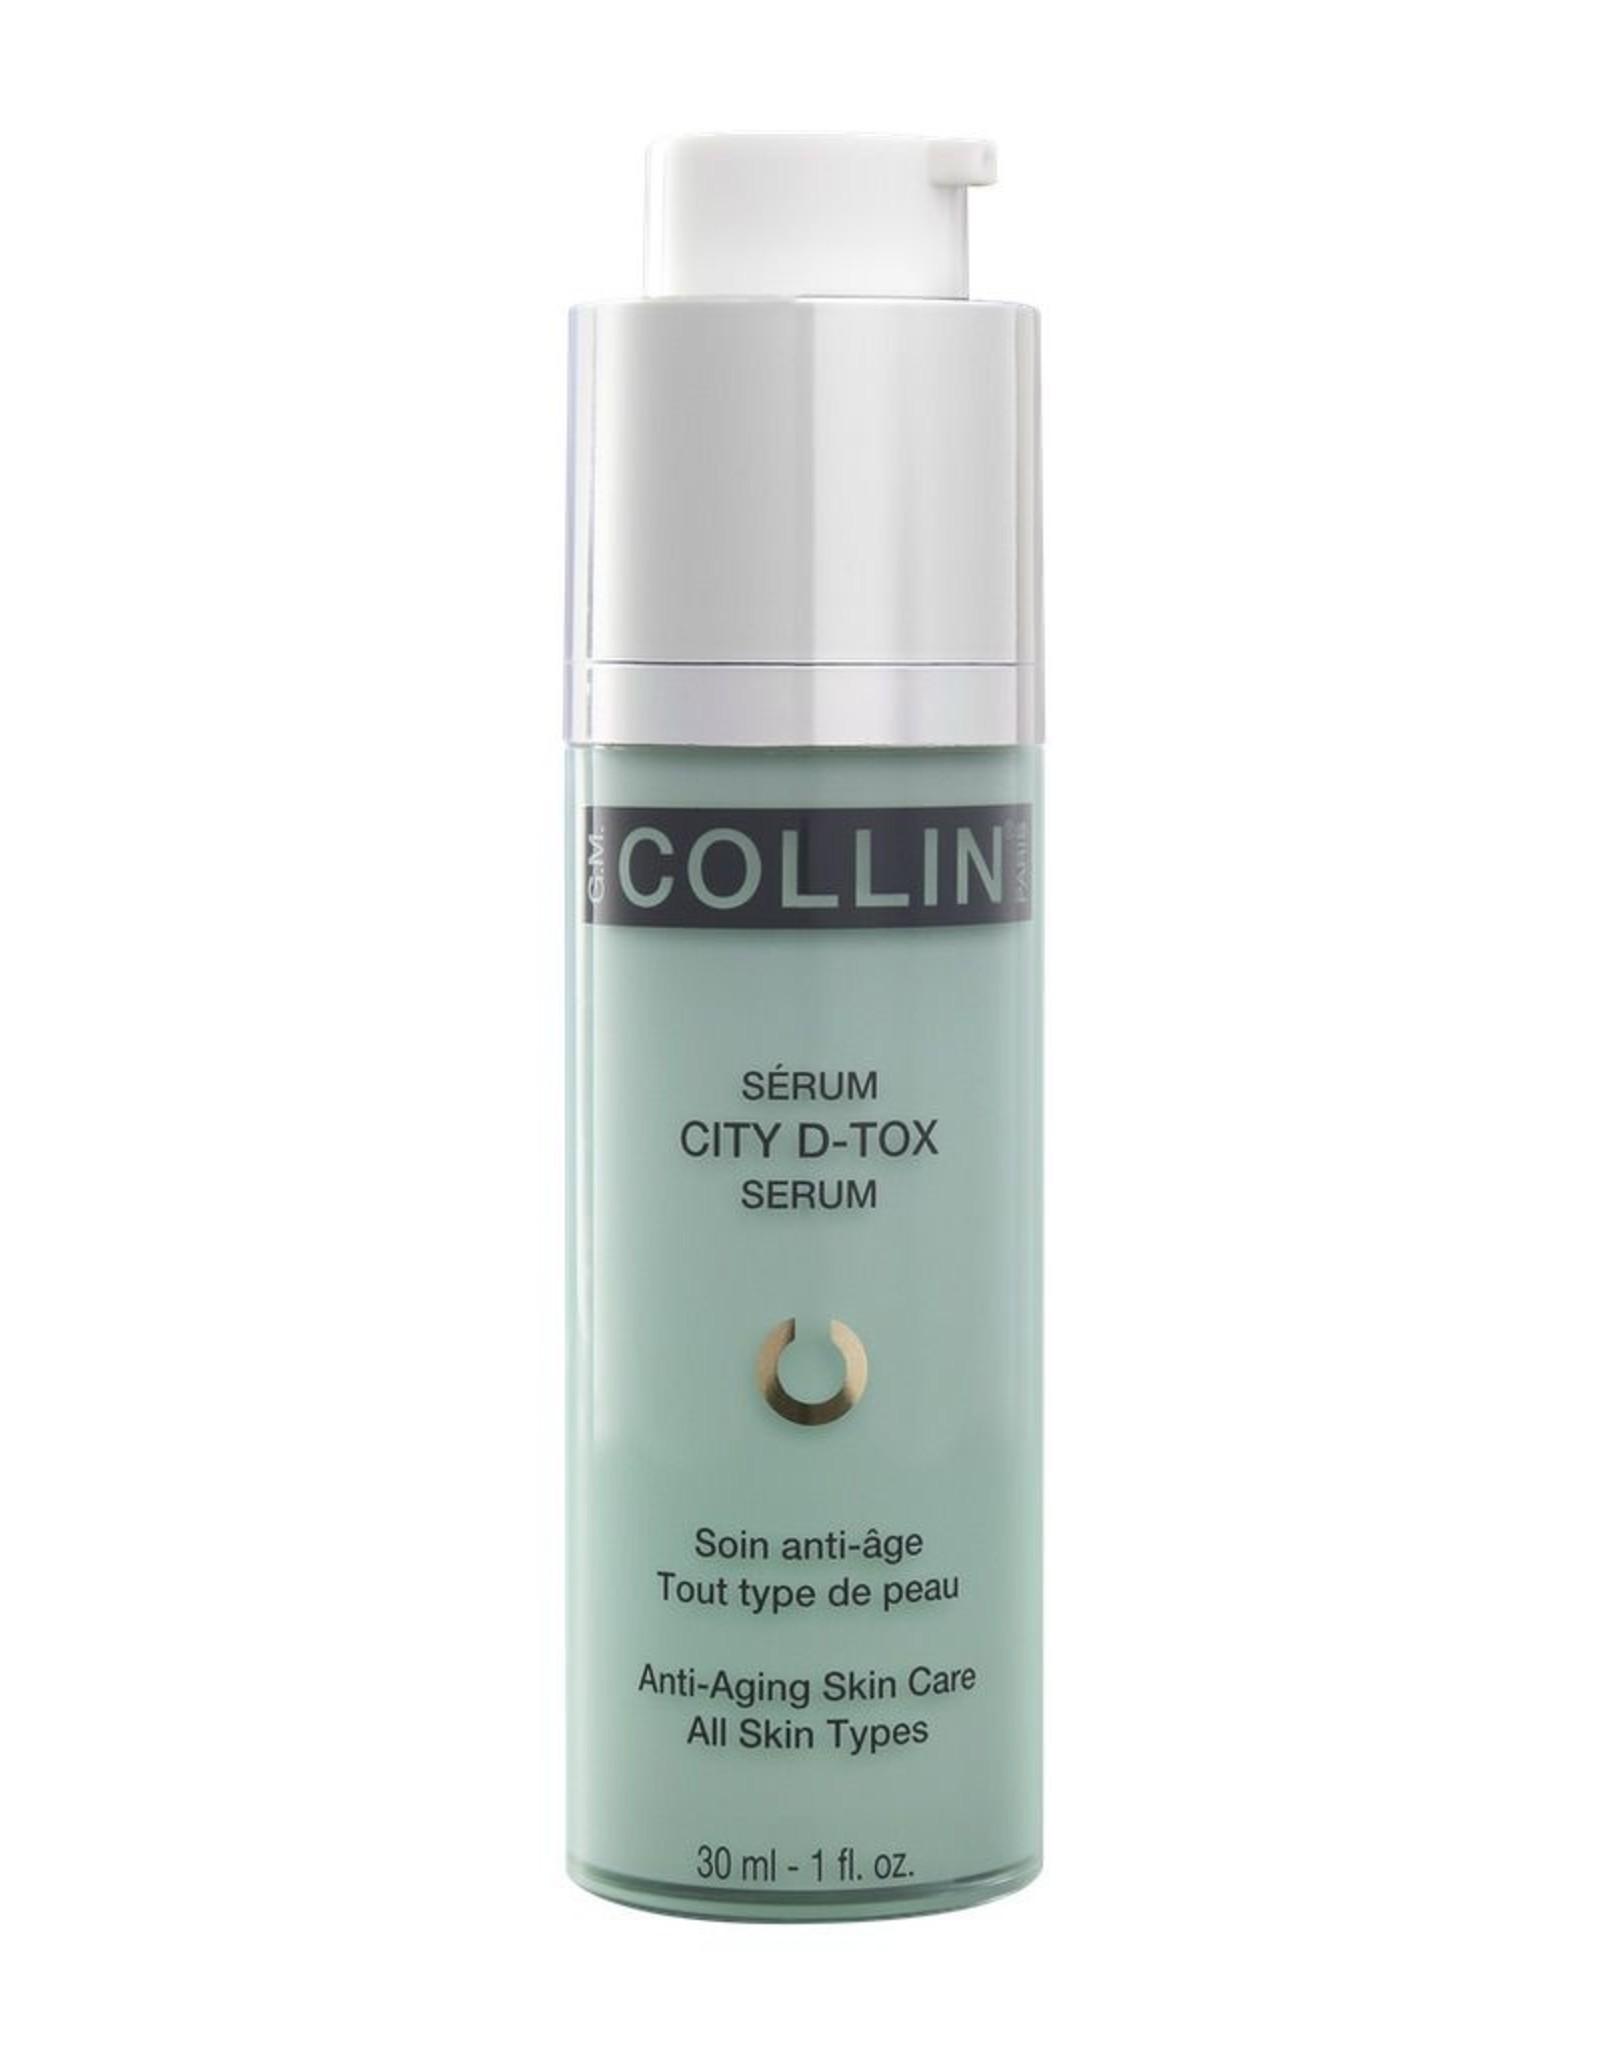 GM Collin G.M. Collin City D-Tox Serum, 30ml